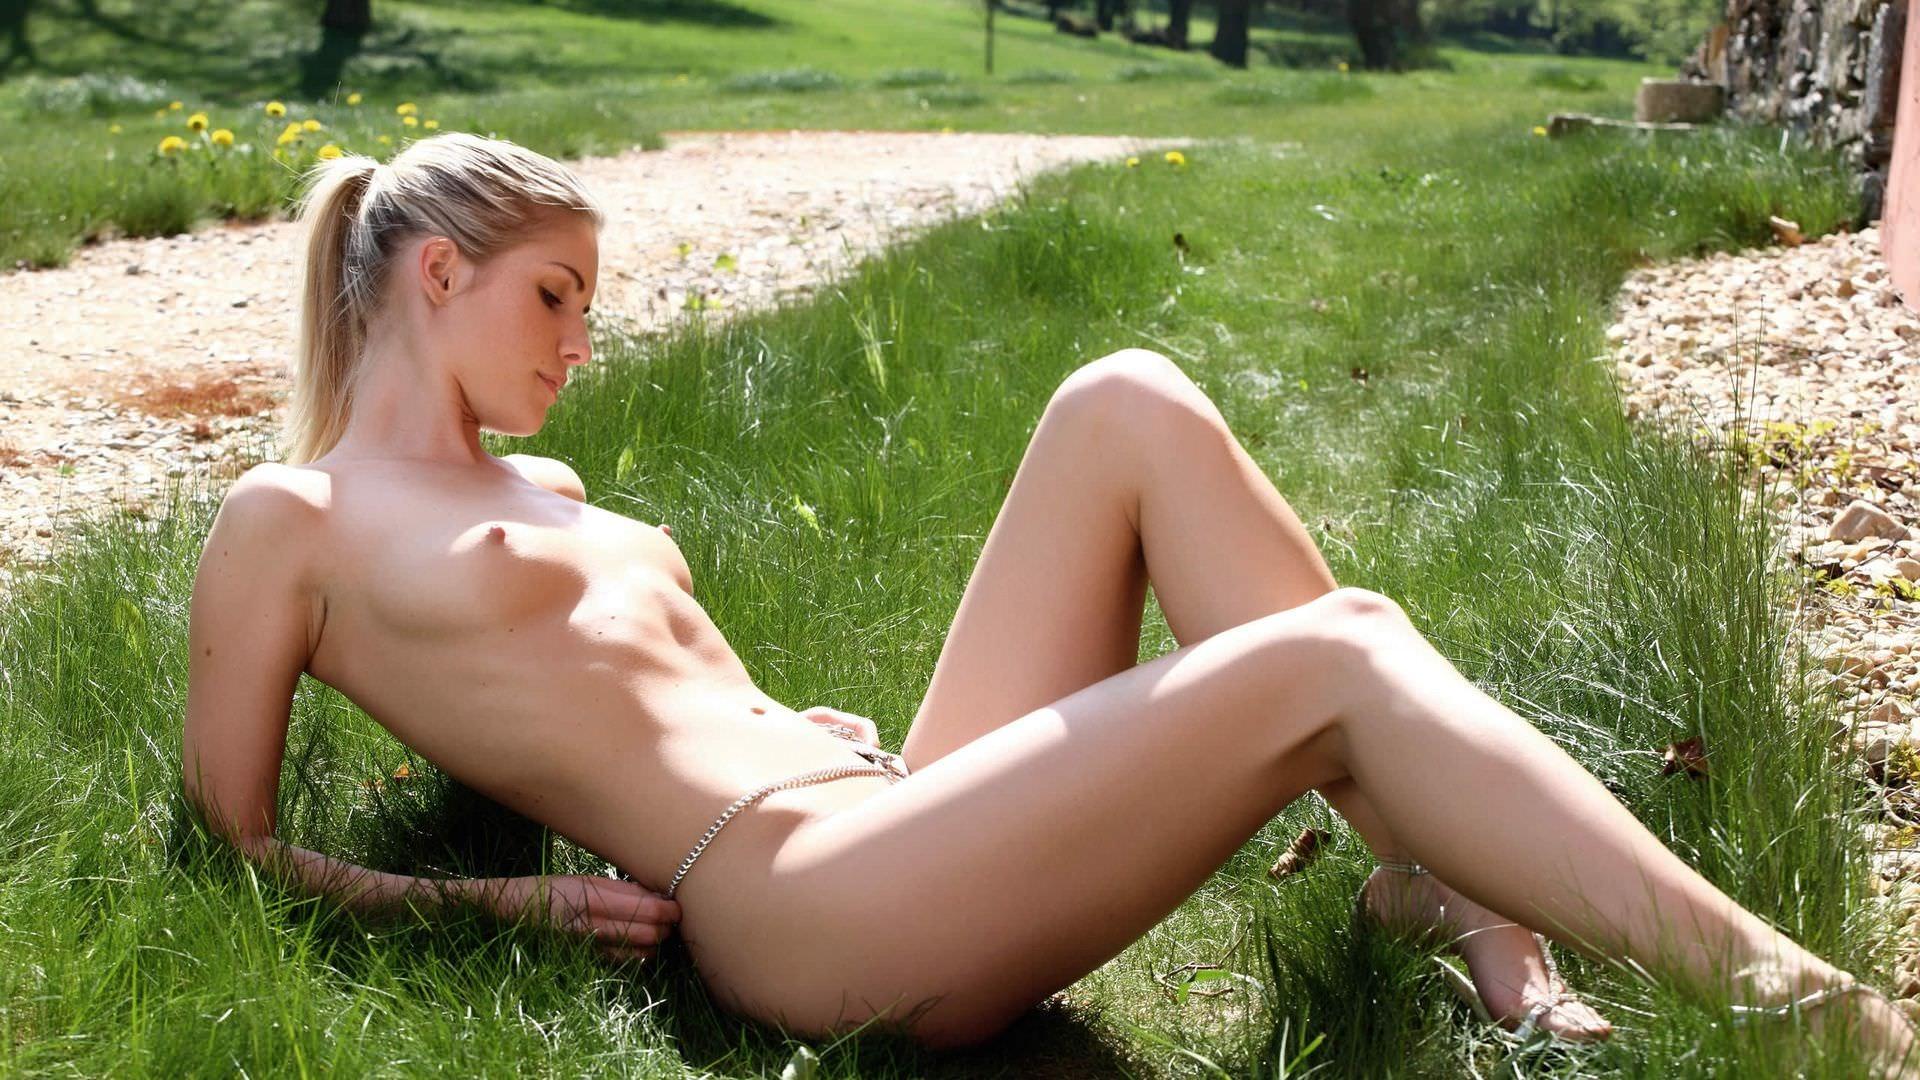 Фото голые девушки на траве 16 фотография